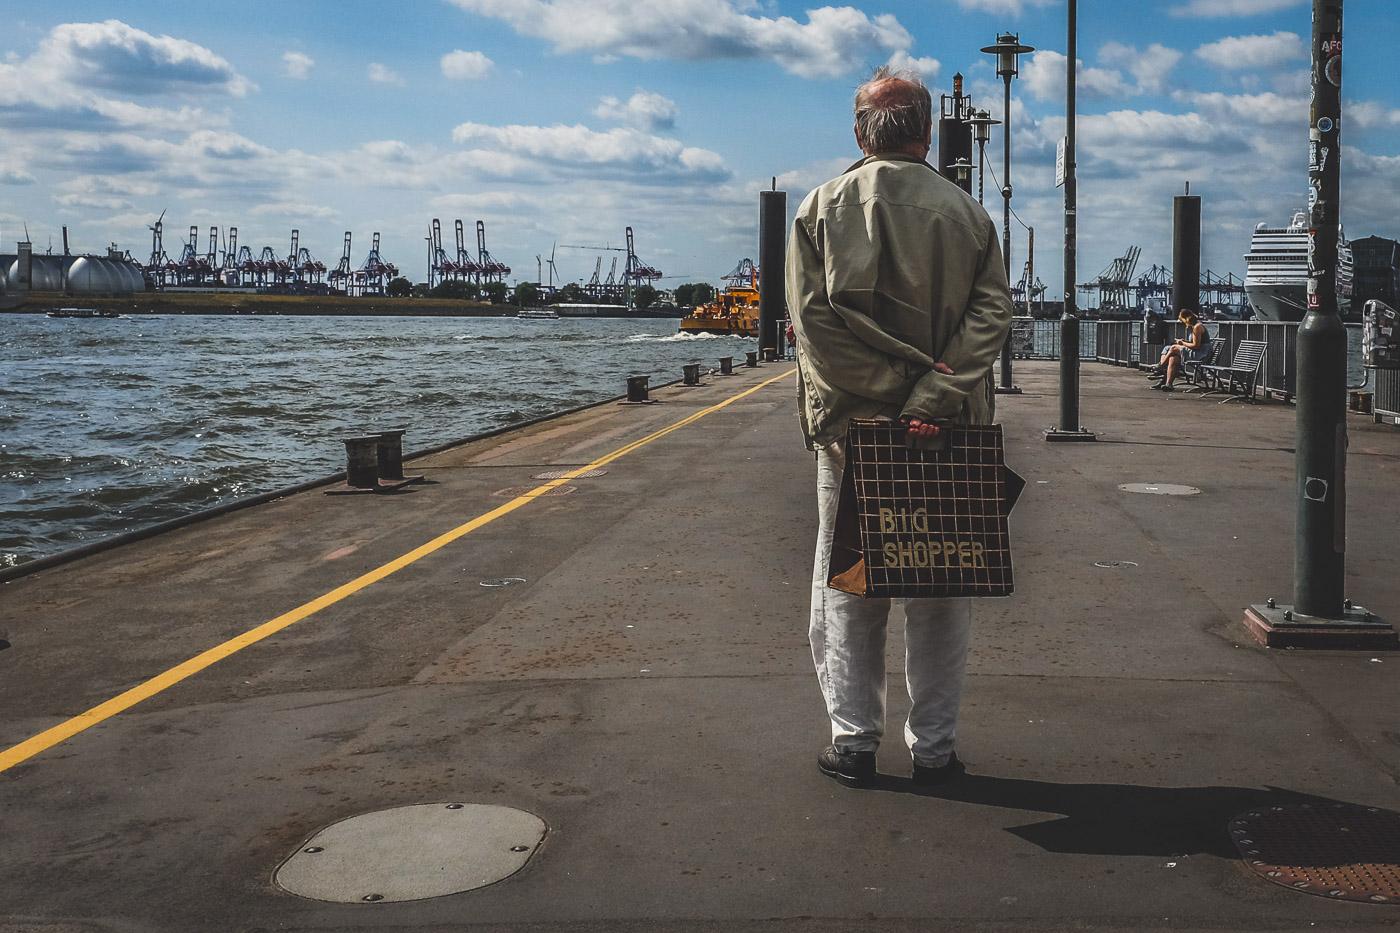 hb images _ Port of Hamburg - 5